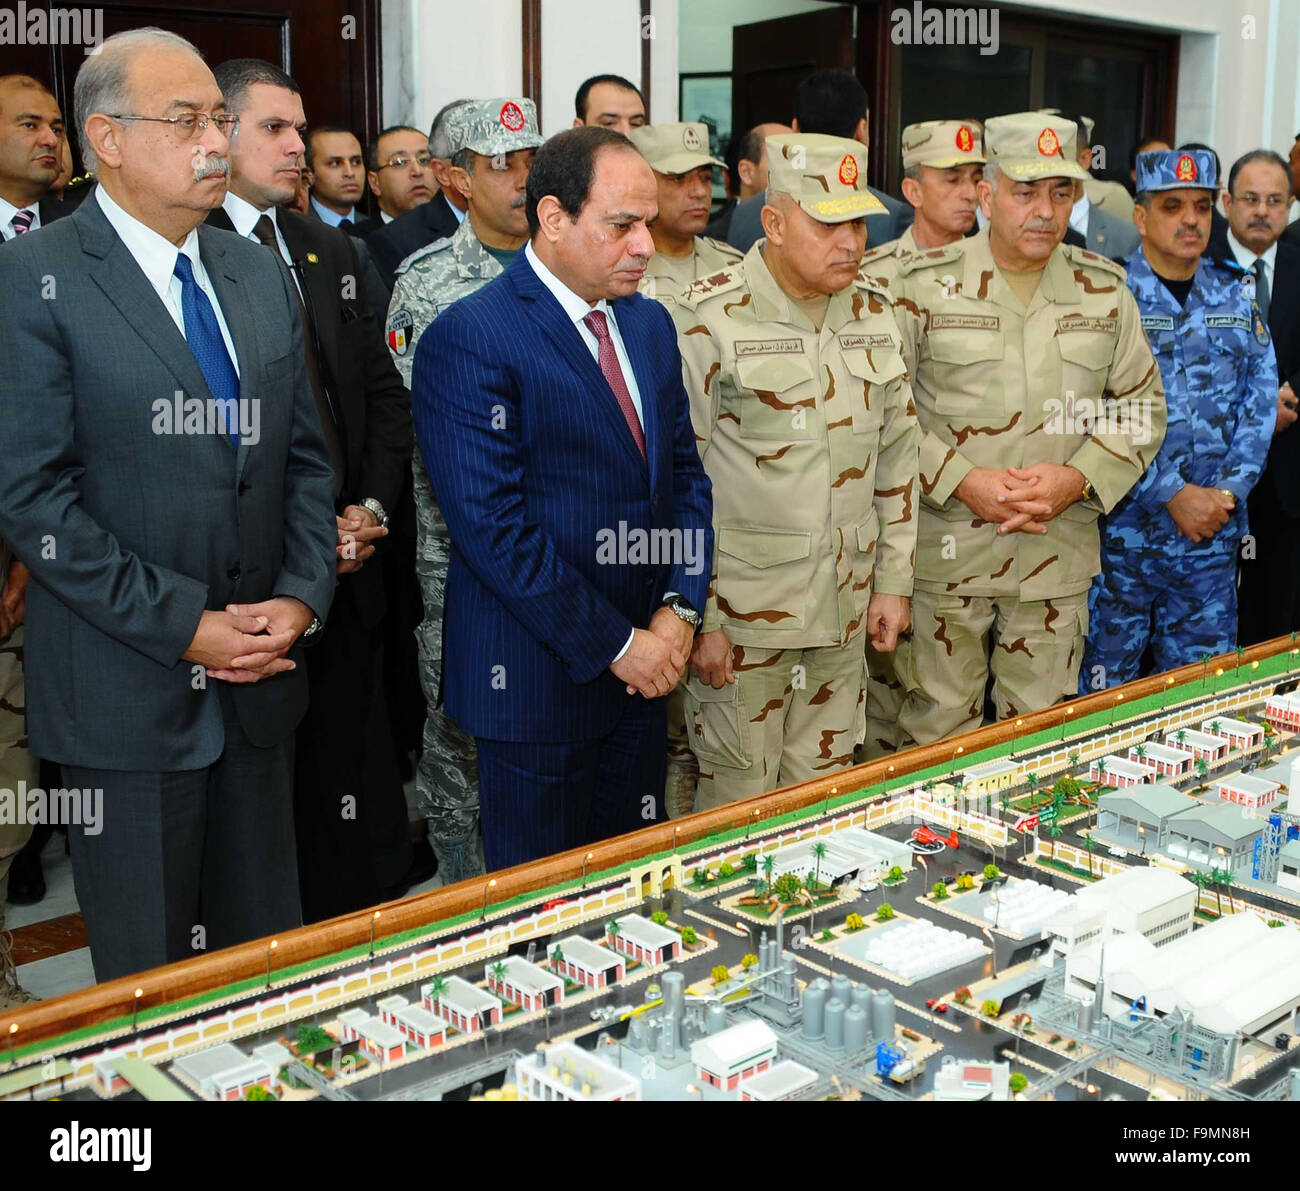 Cairo, Egypt. 17th Dec, 2015. Egyptian President Abdel Fattah al-Sisi, opens Mono and adenosine triphosphate factory Stock Photo